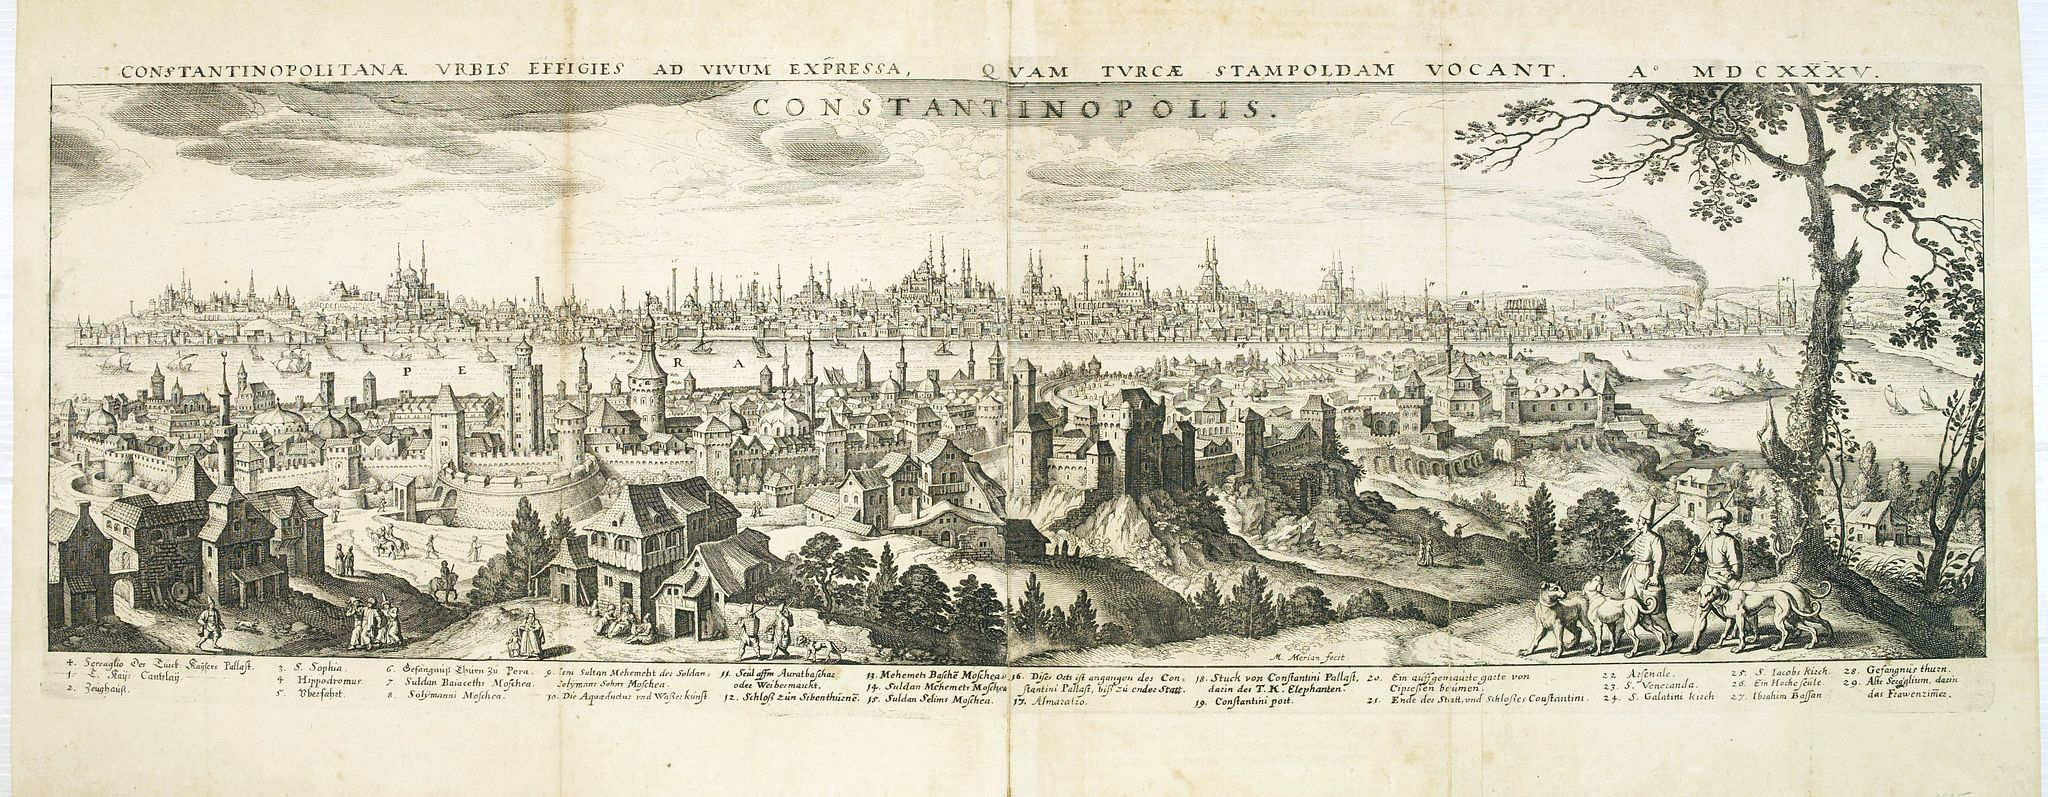 MERIAN, M. -  Constantinopolitanae urbis effigies ad vivum expressa, quam Turcae Stampoldam vocant. A° MDCXXXV.